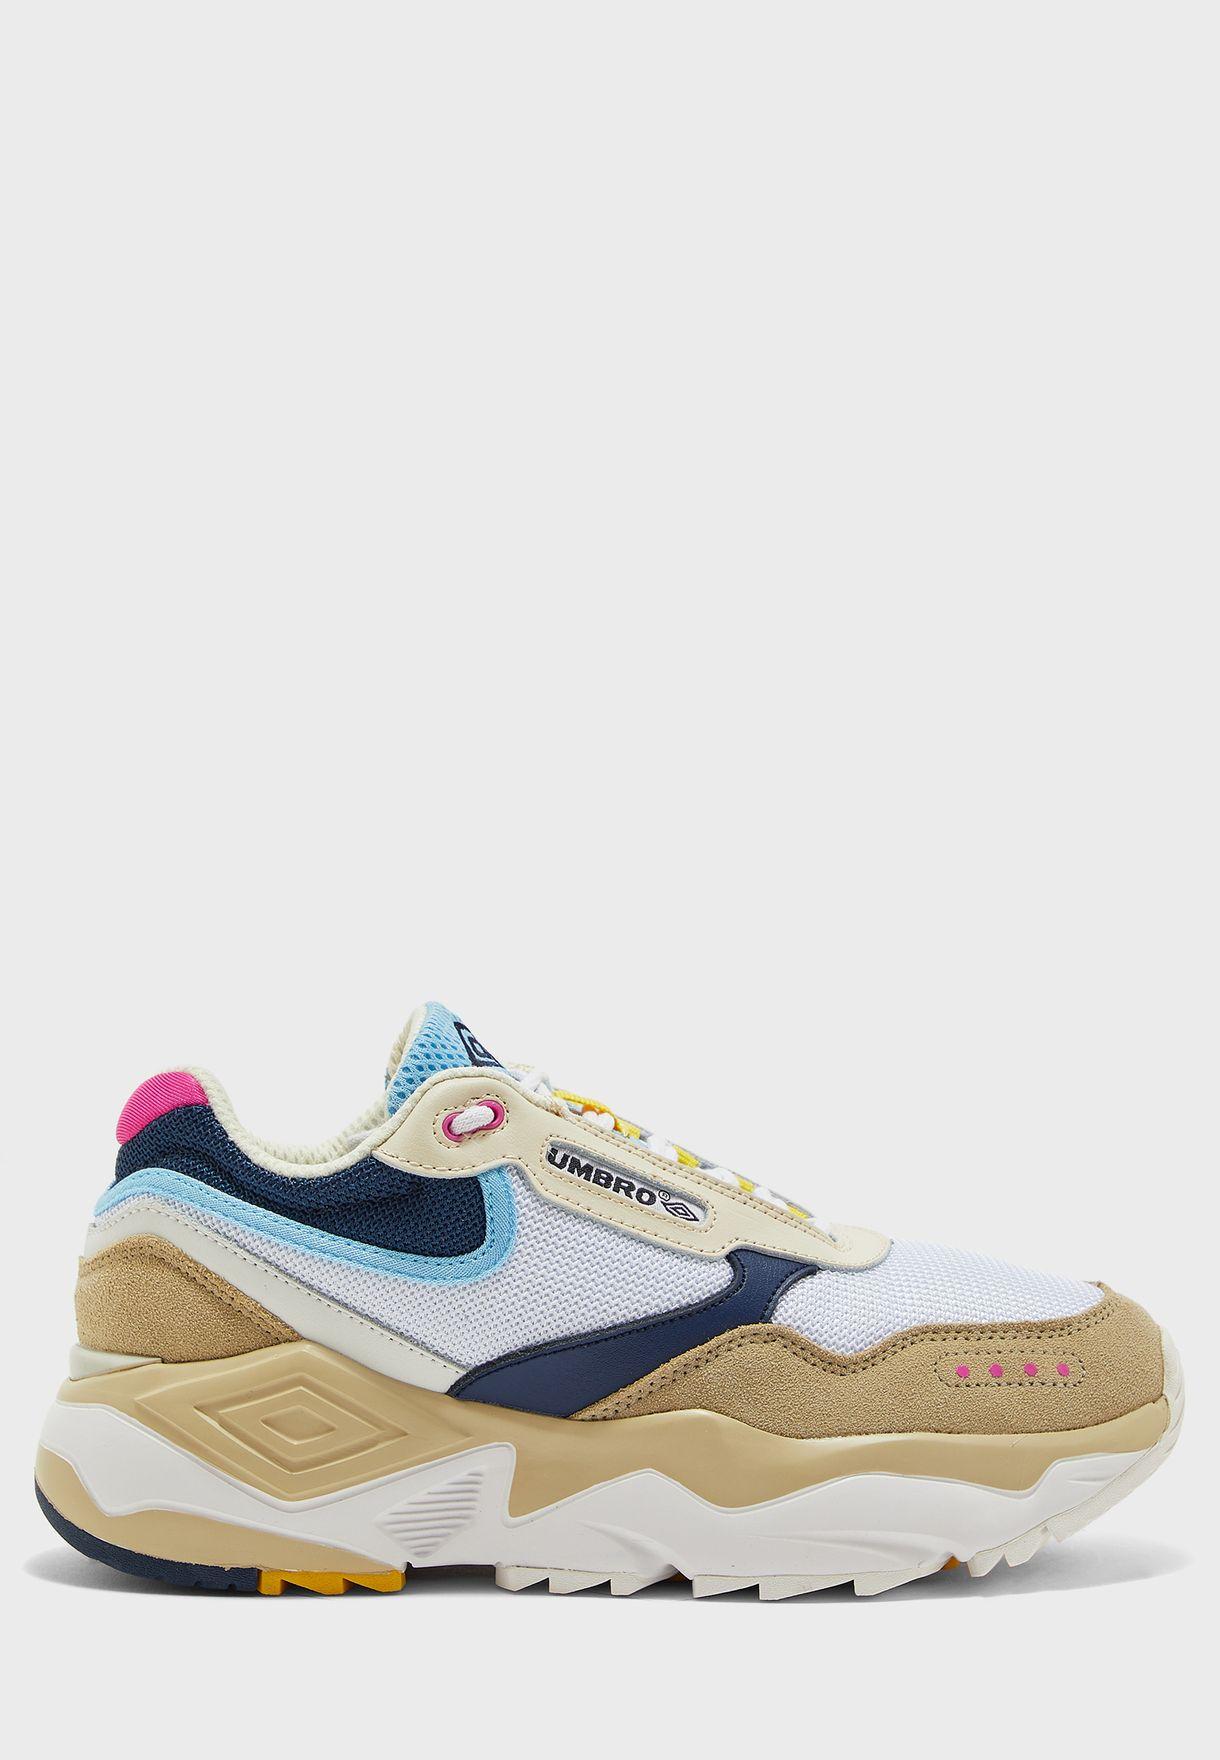 umbro walking shoes